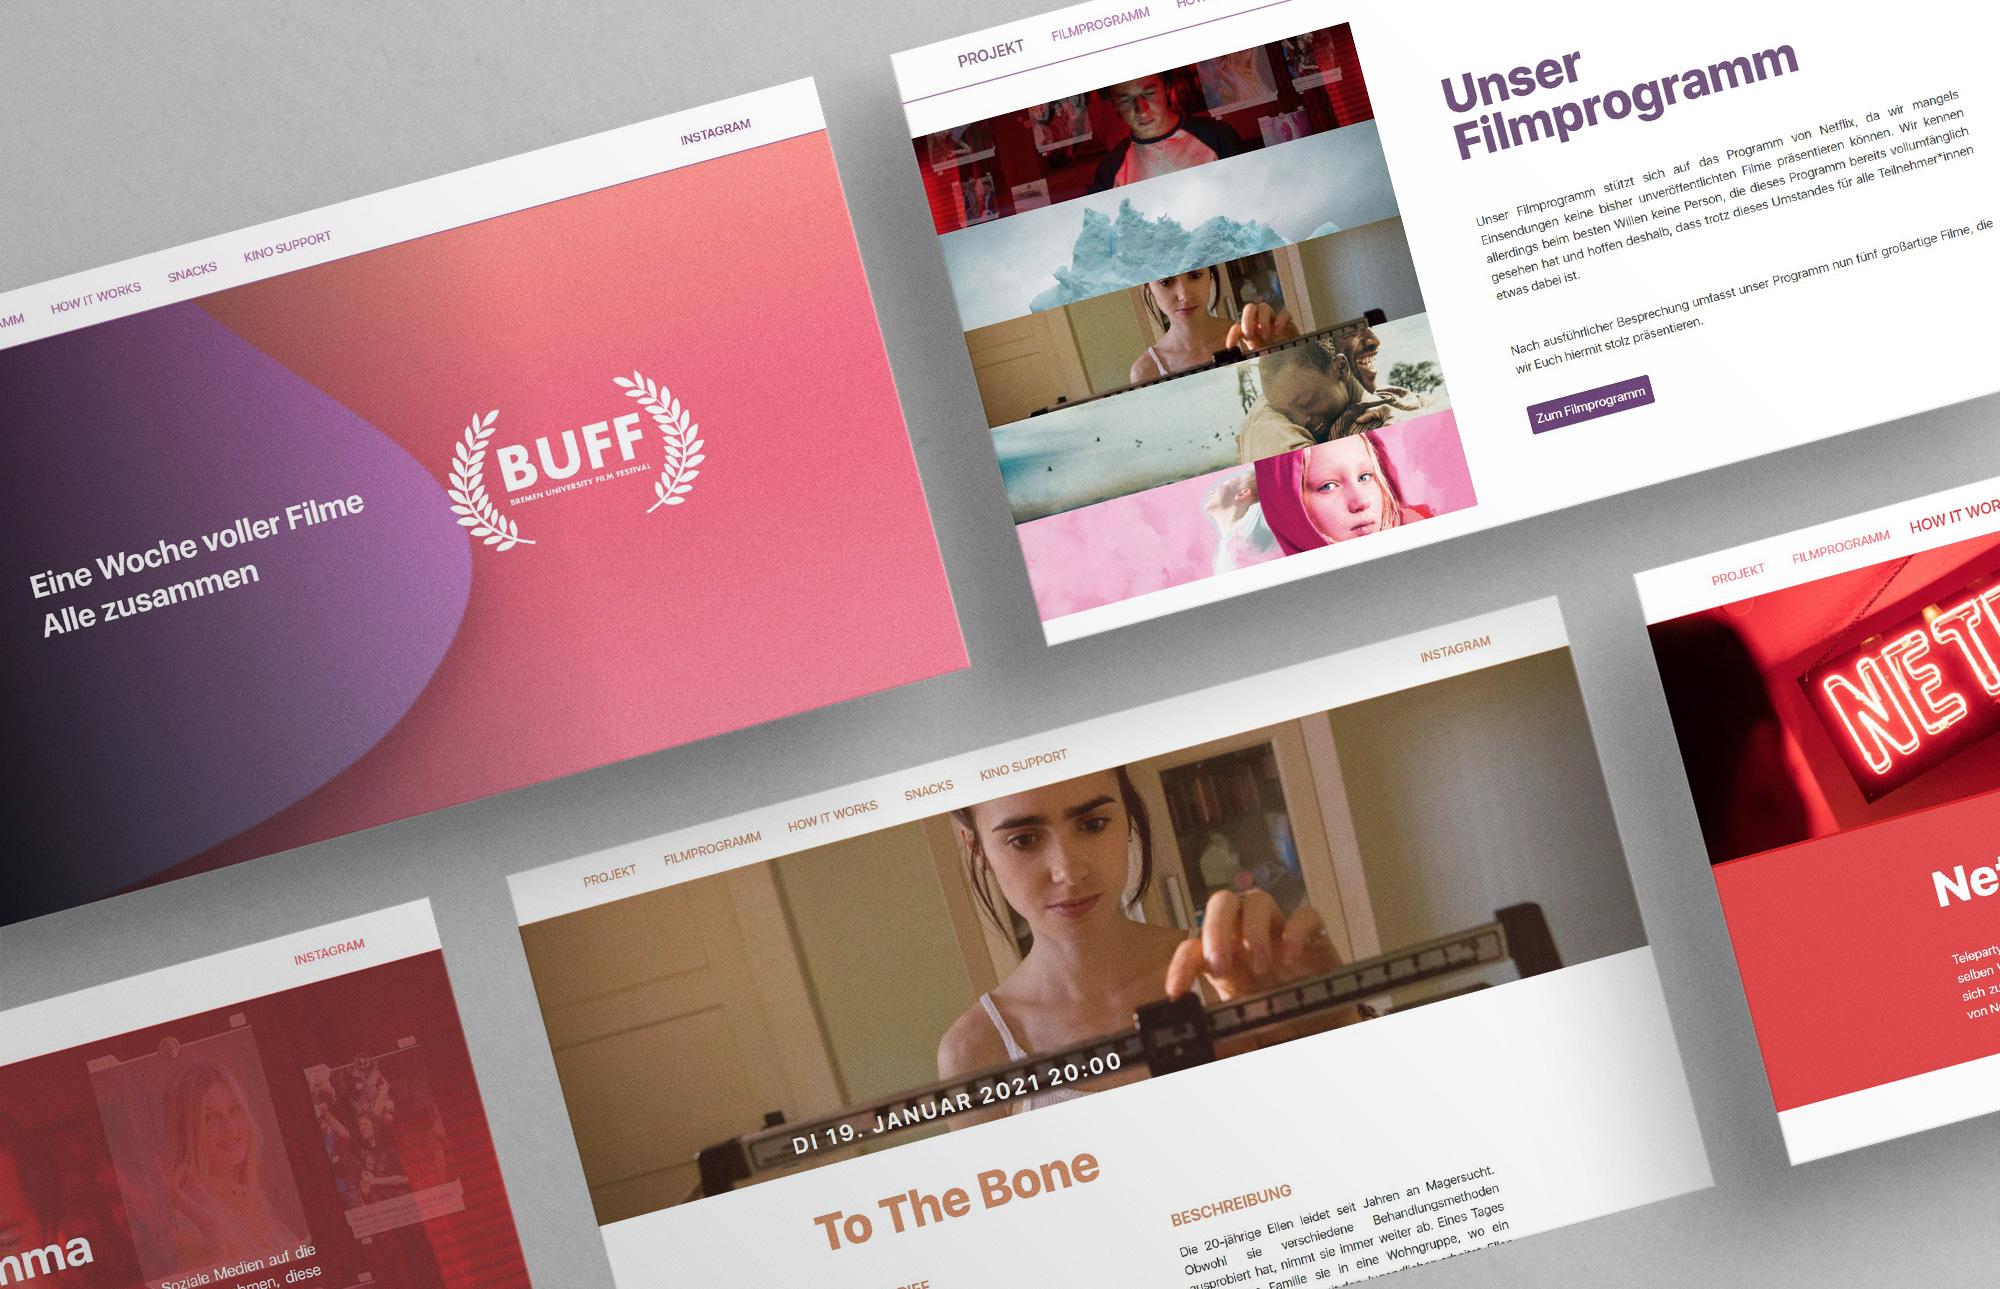 Bremen University Film Festival Website Overview Montage